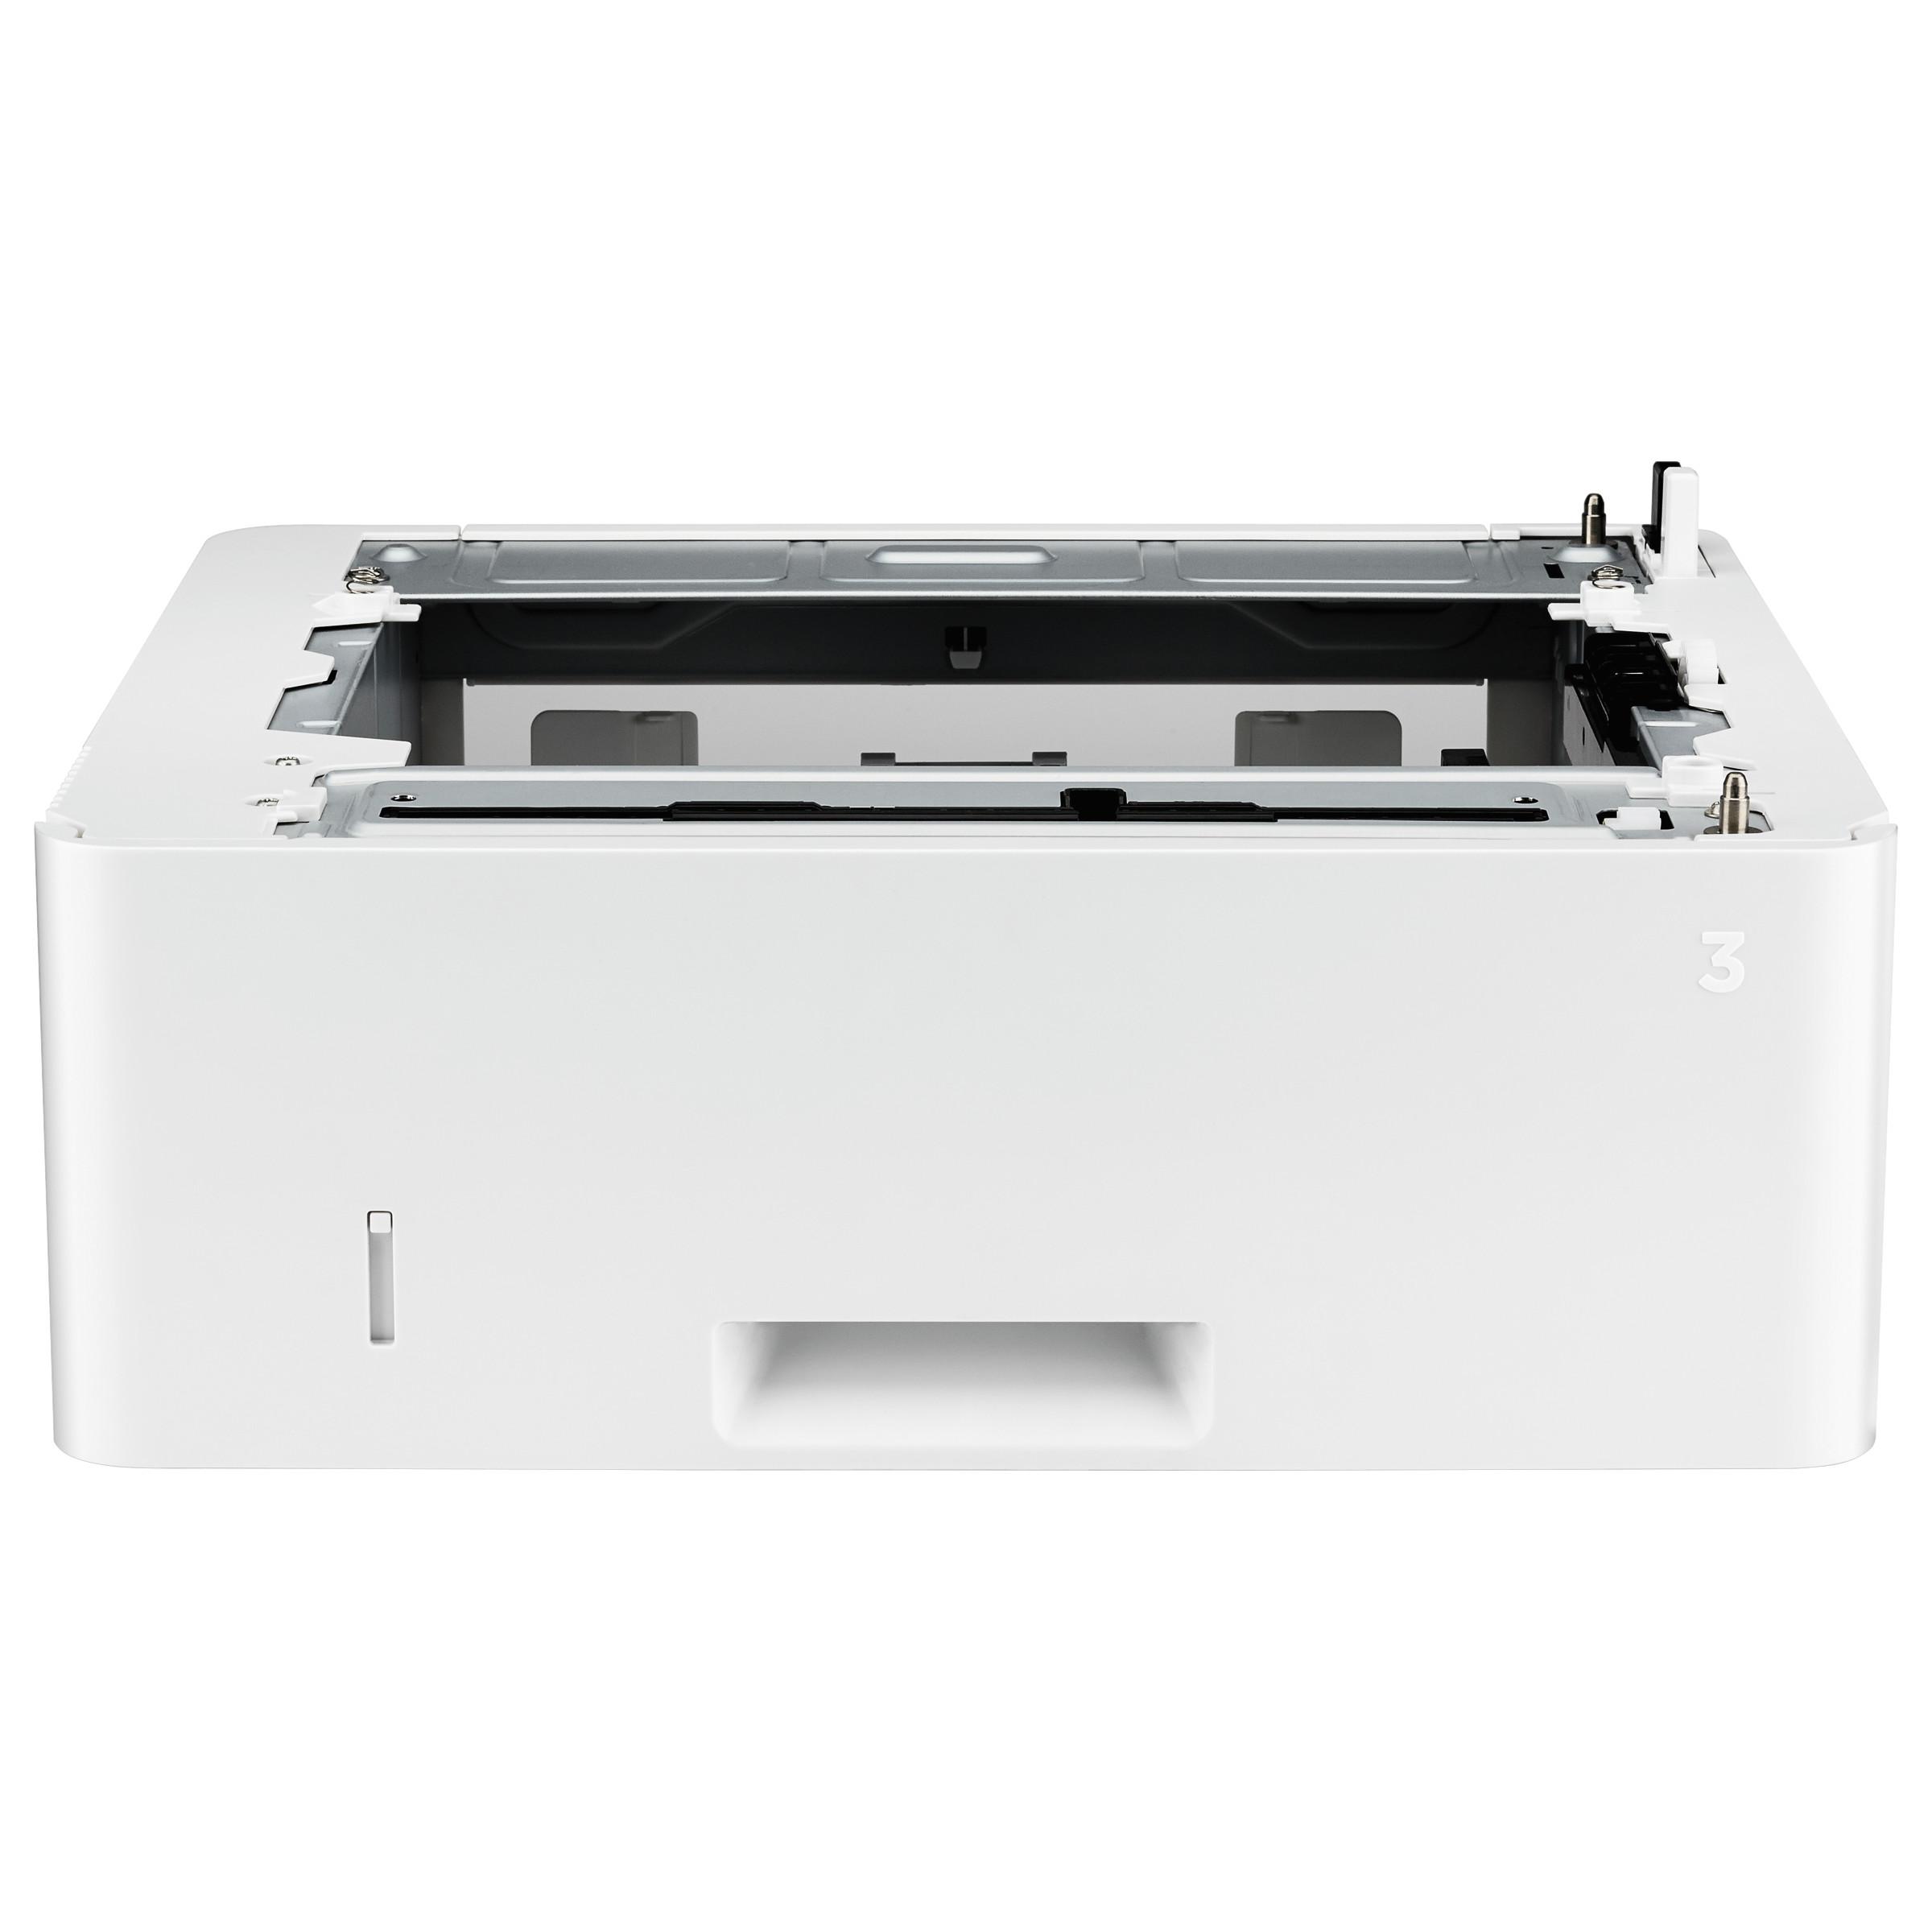 HP 550-Sheet Feeder Tray for LaserJet Pro M402 Series Printers -HEWD9P29A